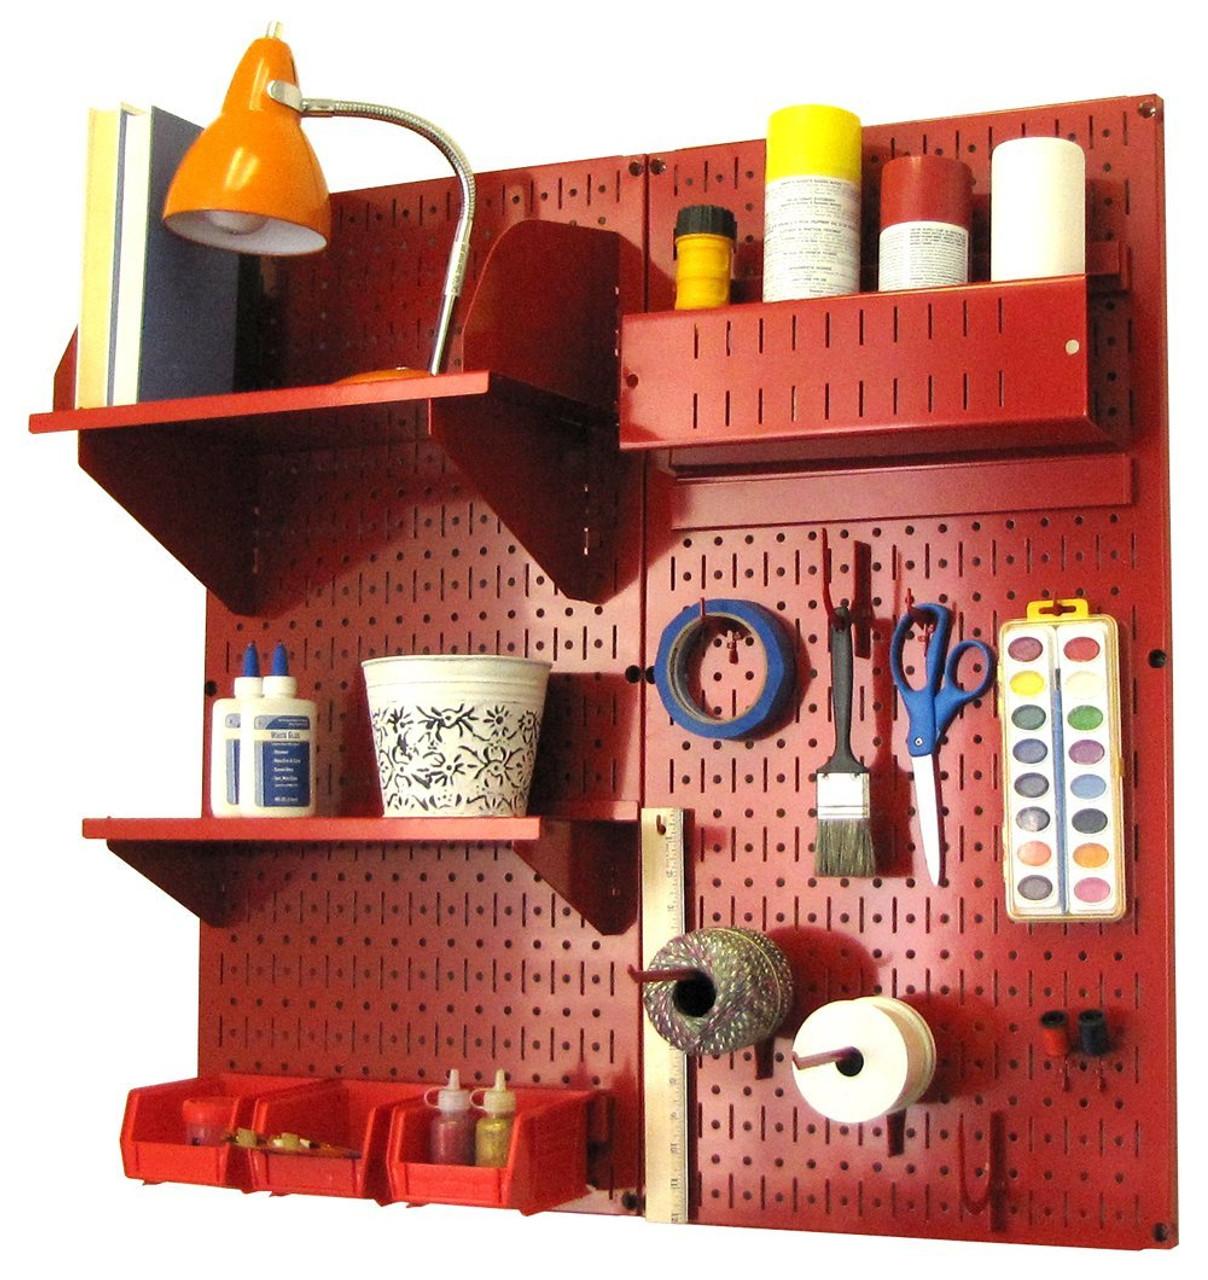 pegboard for crafts  sc 1 st  Wall Control & Chic Craft Peg Board | Modern Pegboard Craft Organizer | 30-CC-200 ...